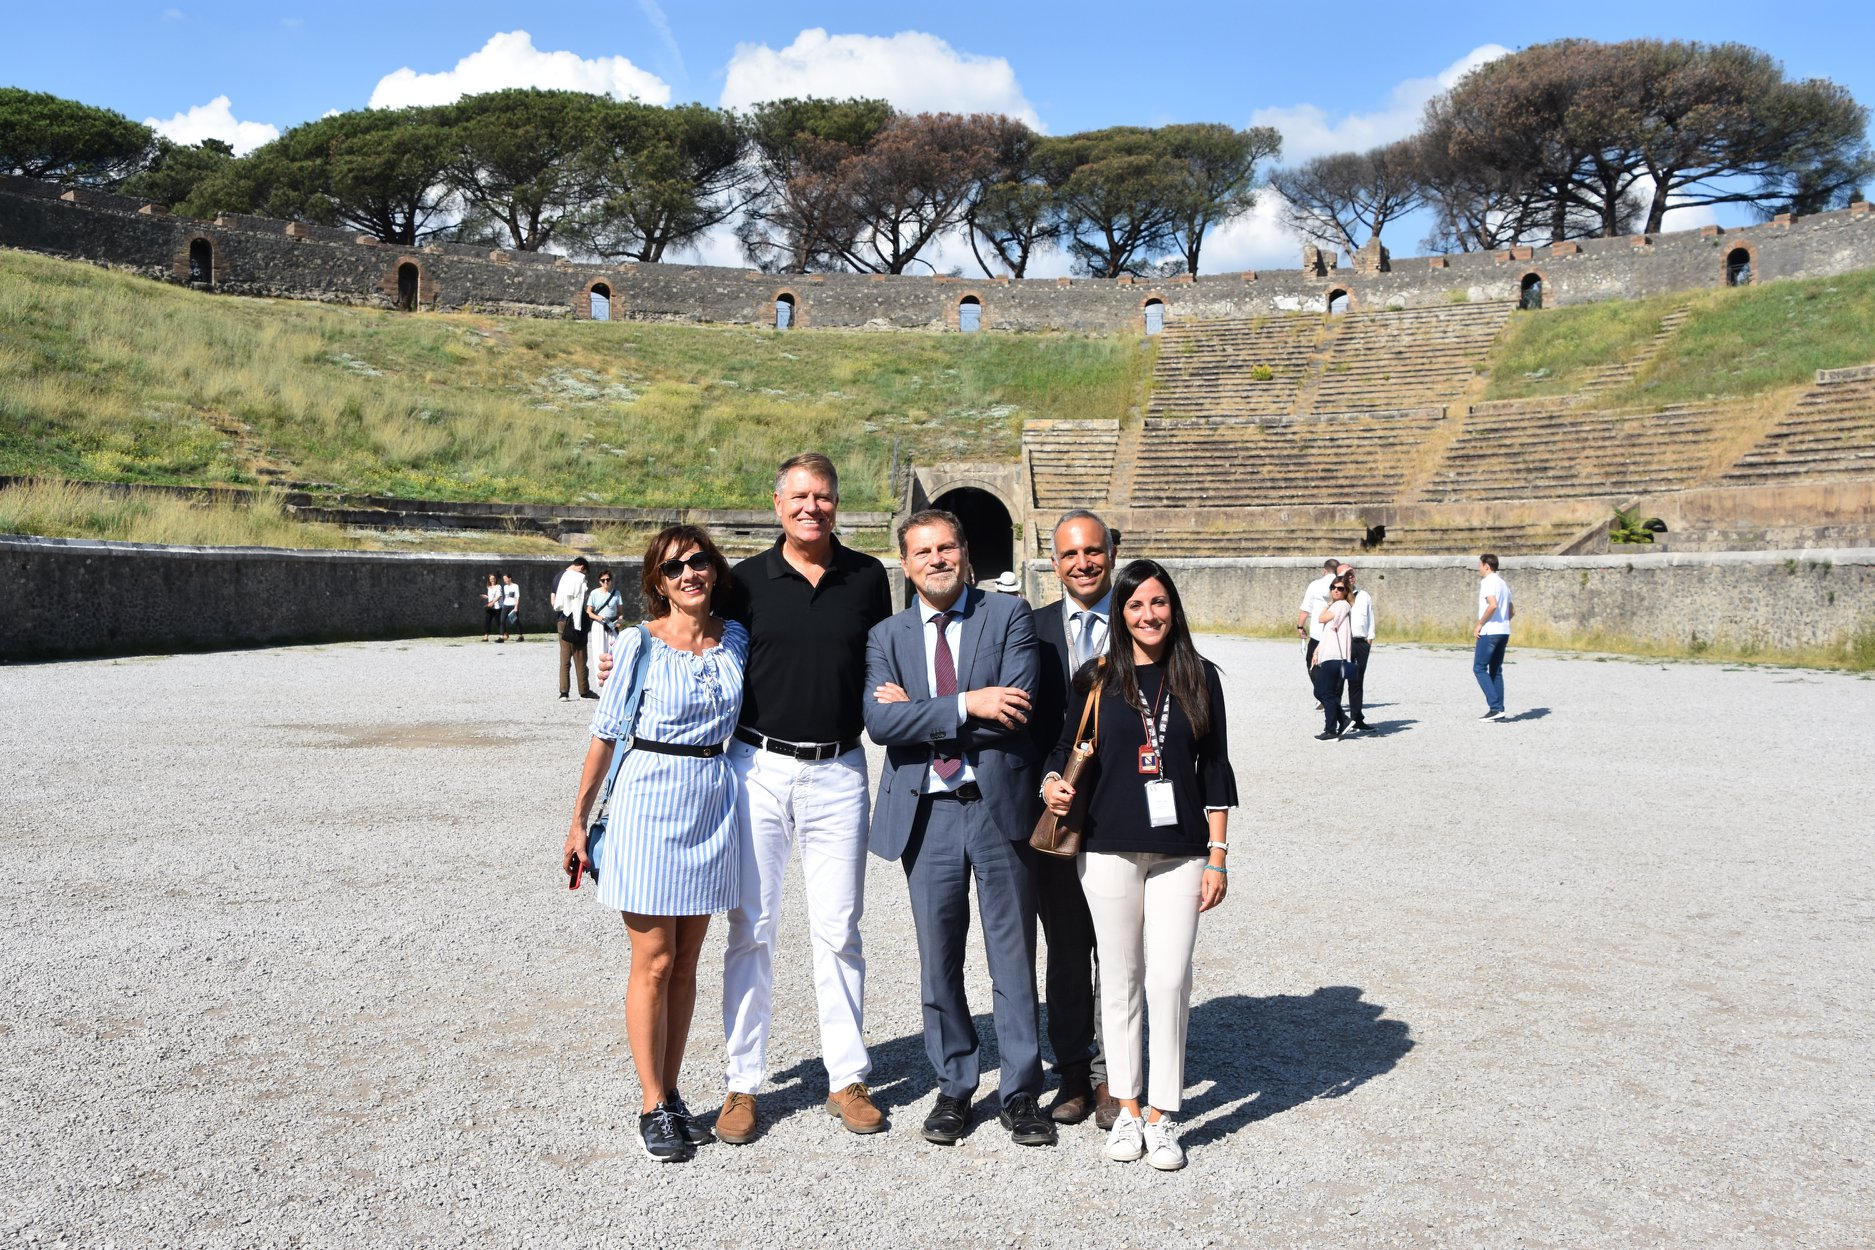 Klaus Iohannis și Carmen au vizitat pompeii